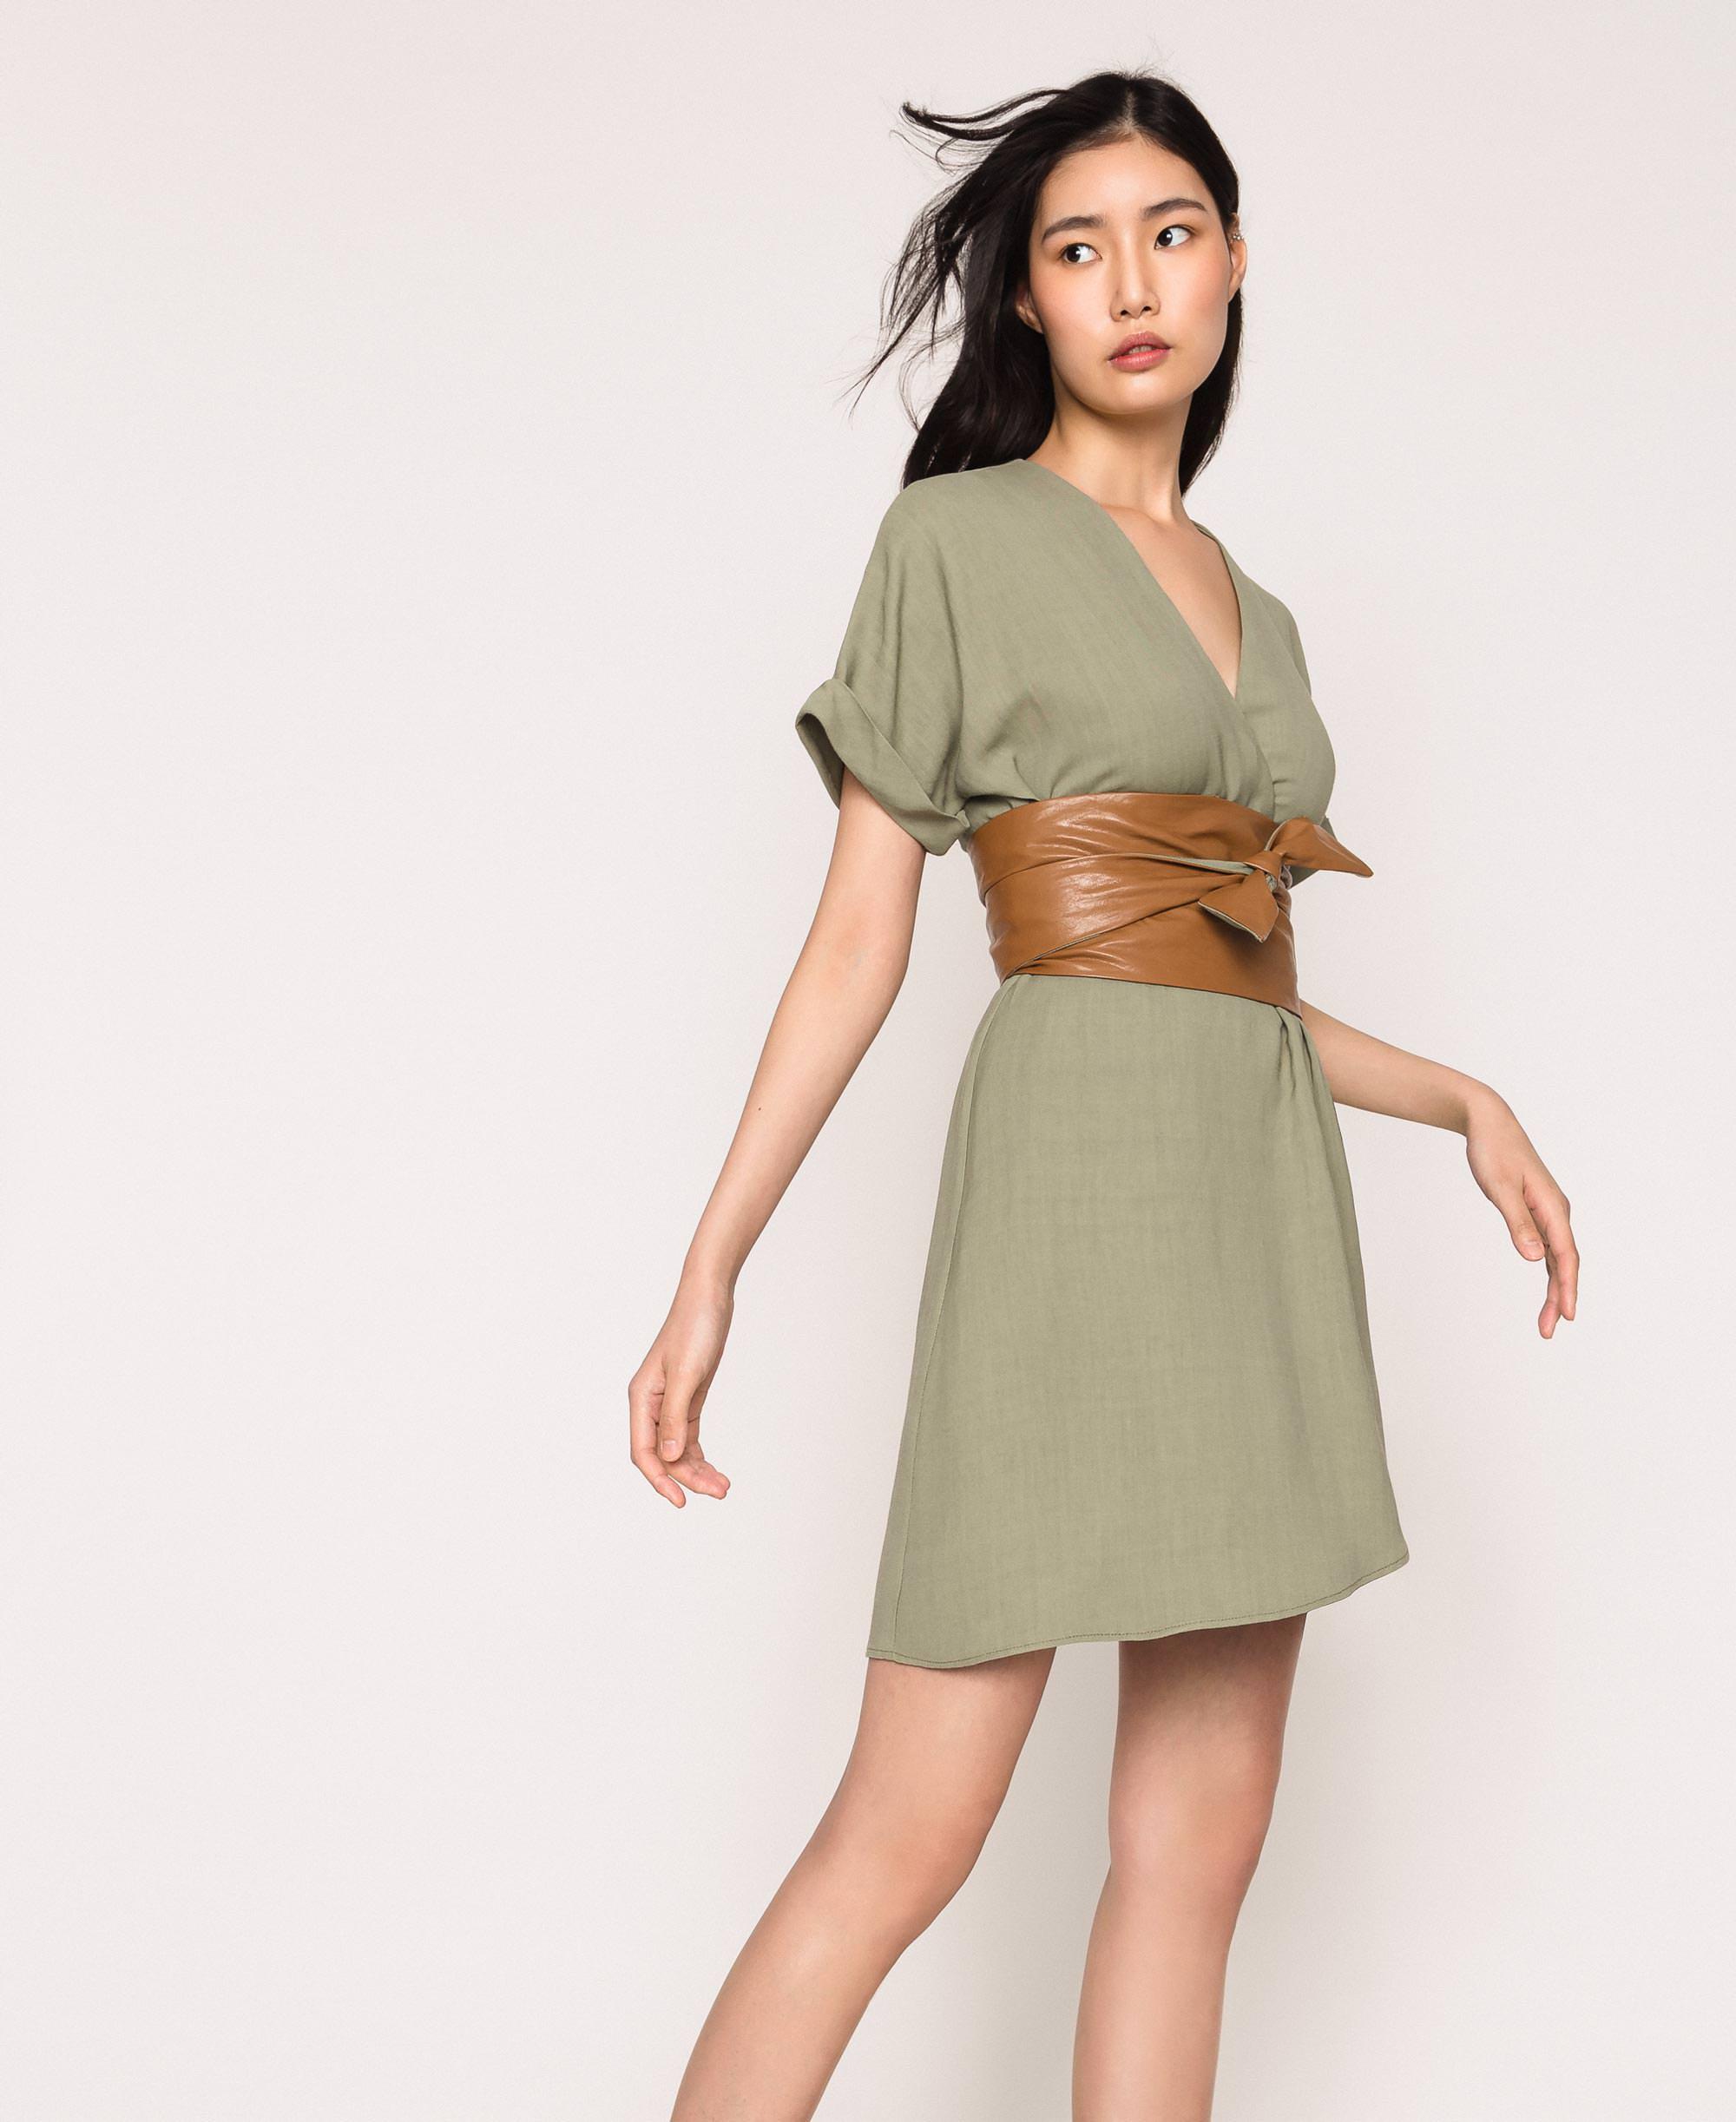 Kleid Aus Canvas Und Lederimitat Frau Grun Twinset Milano